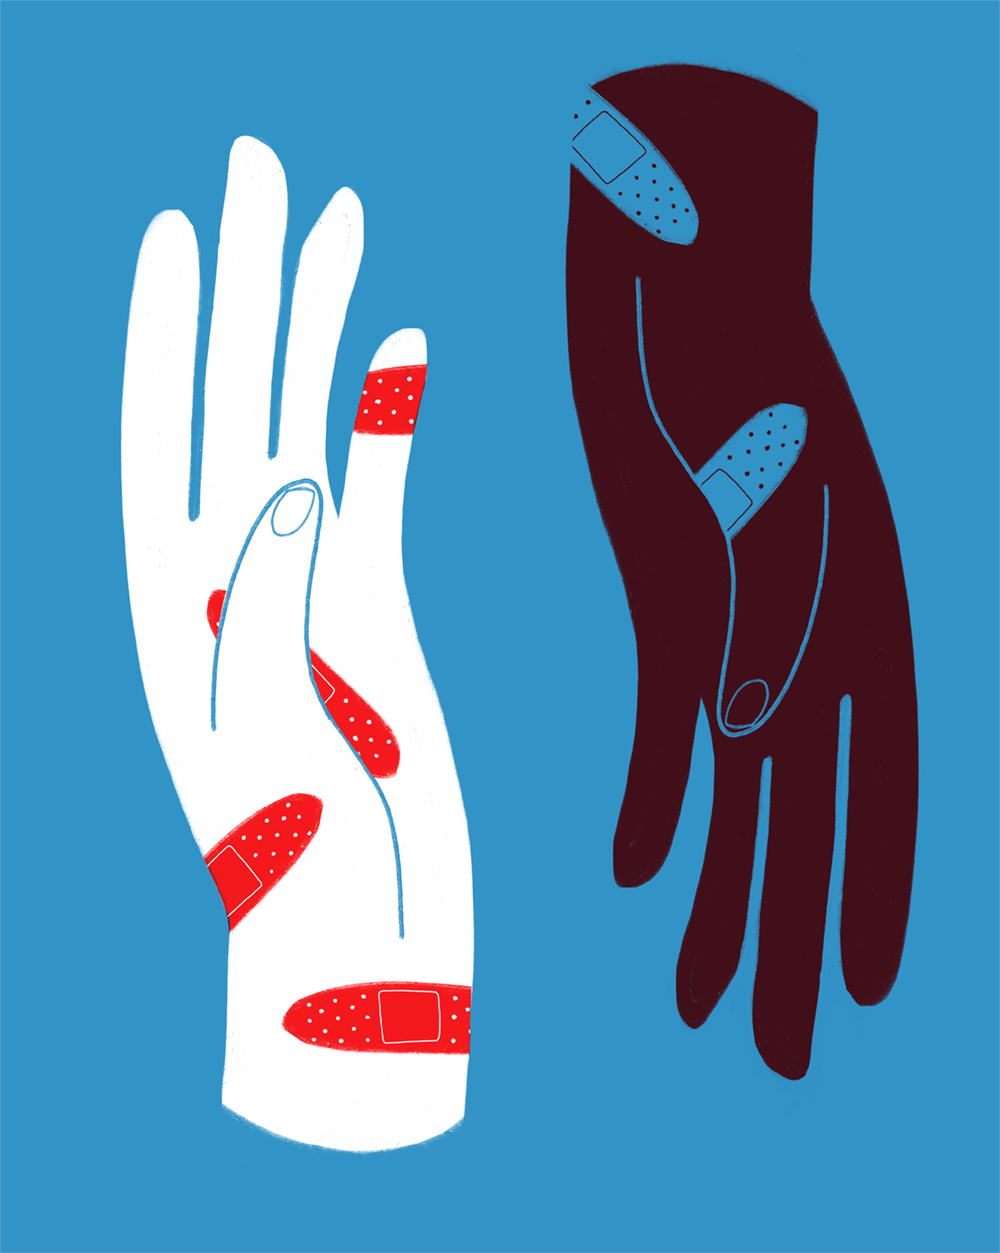 Loveblood Creative - Sonny Ross - Dermatillamania-GutsMagazine.jpg